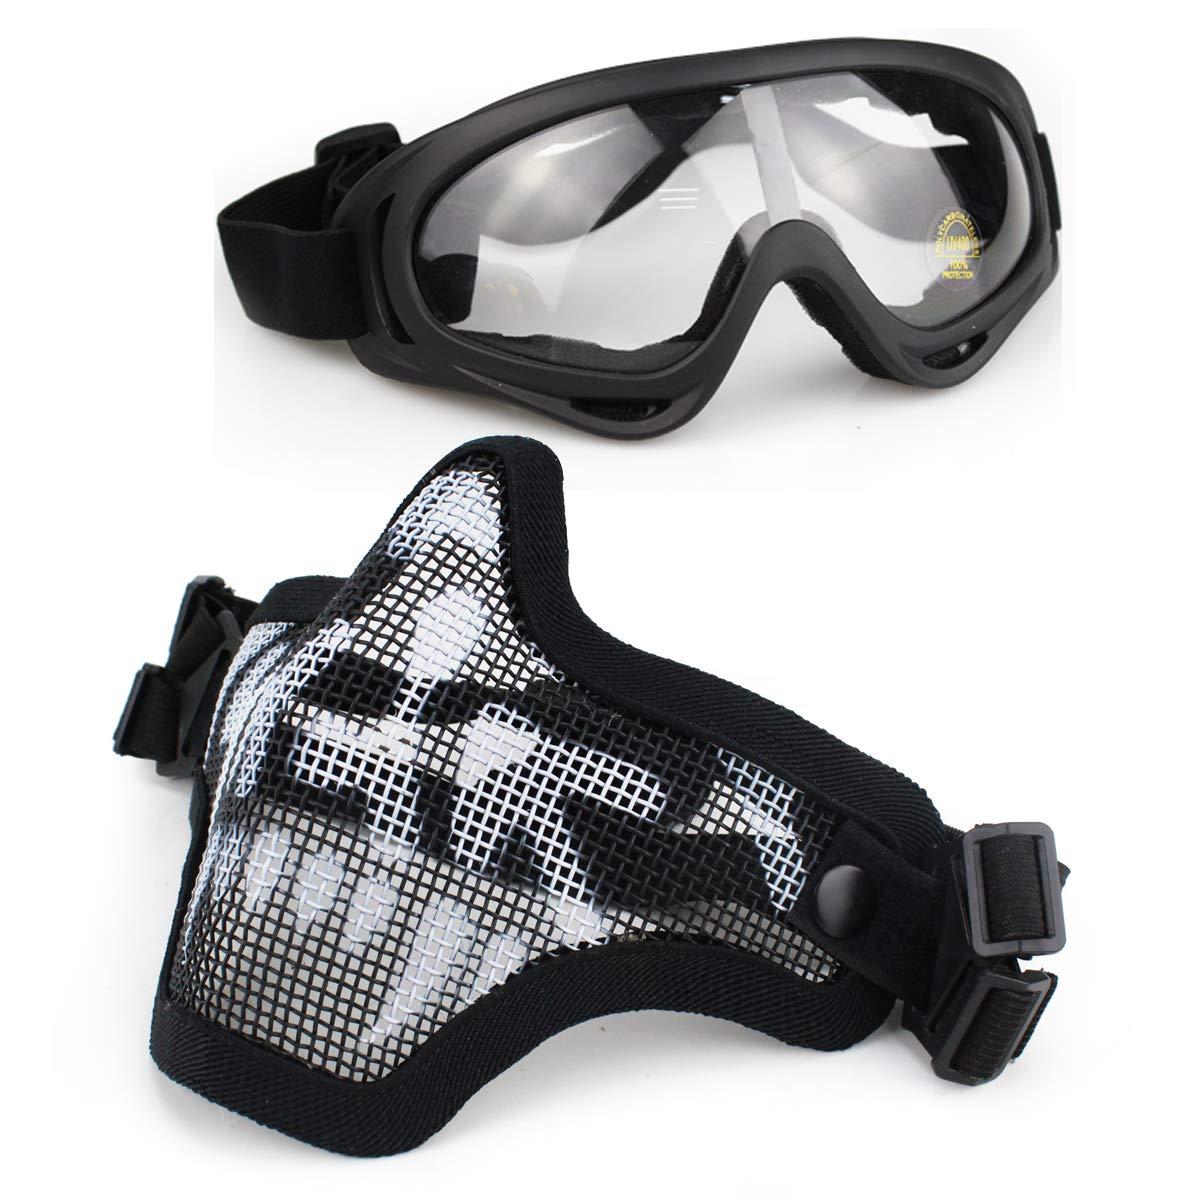 Aoutacc Airsoft Goggles Gaiter Bandana